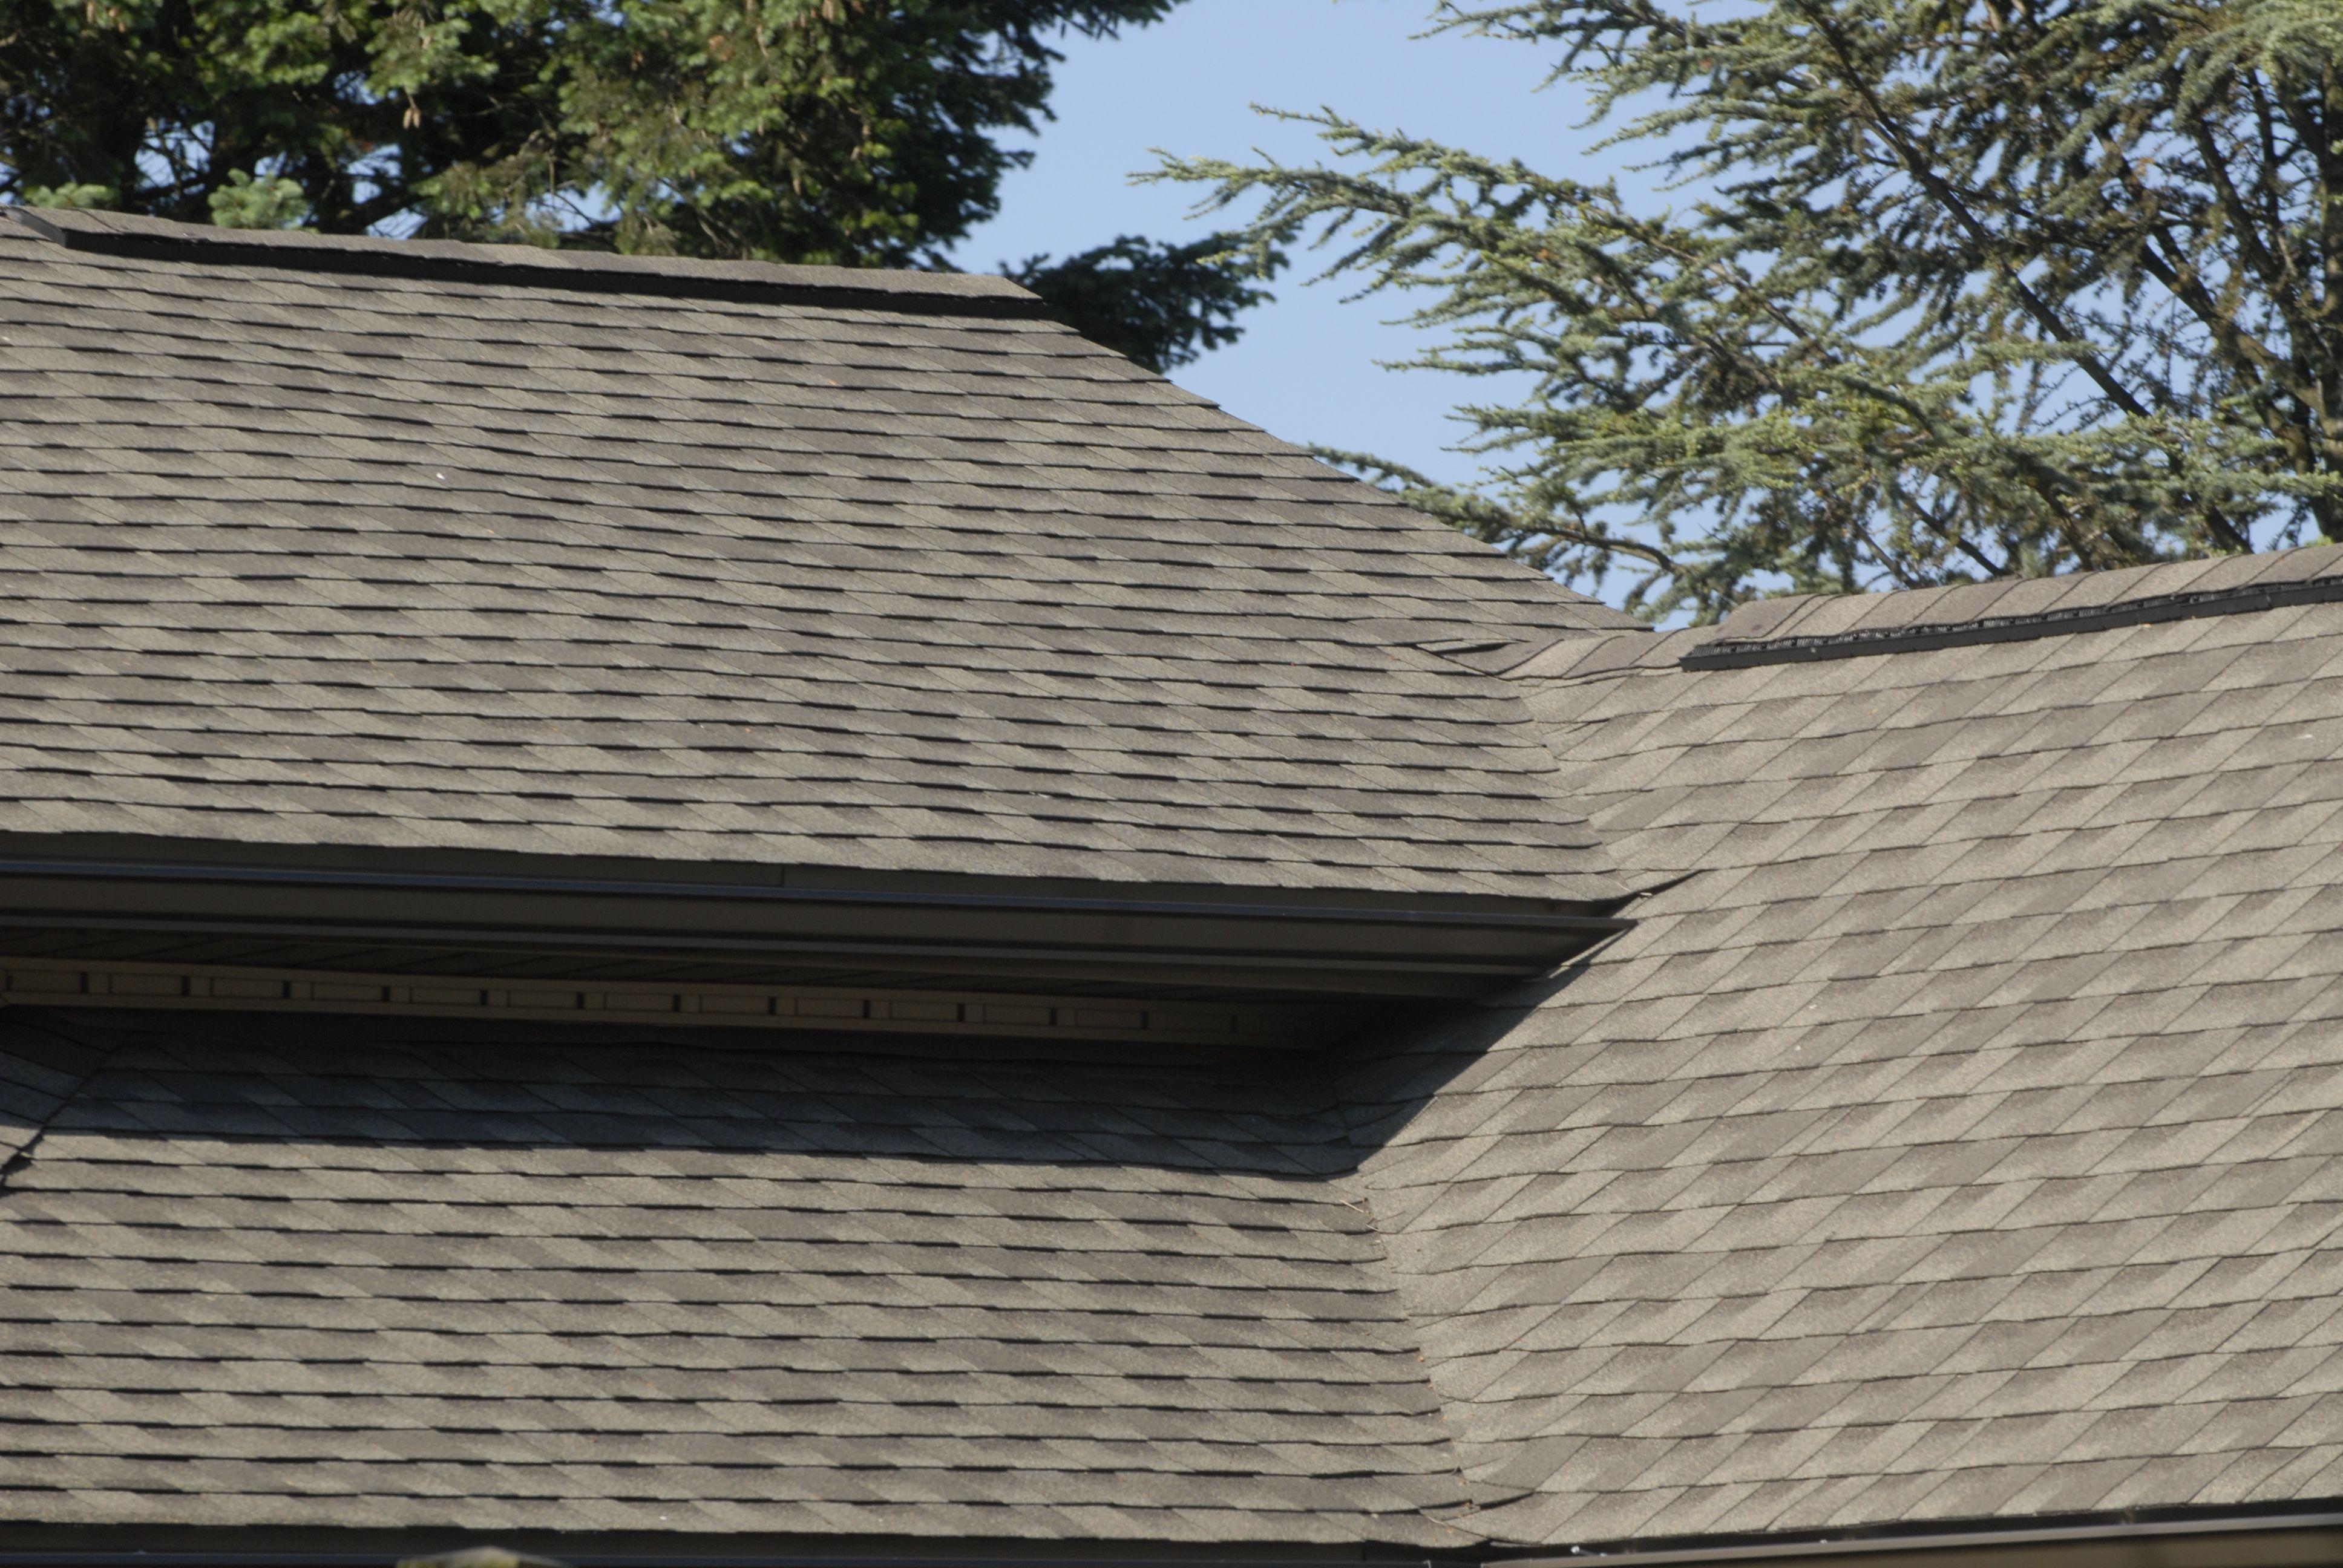 Gaf Timberline Hd Lifetime Shingles Roof Shingles Shingling Roofing